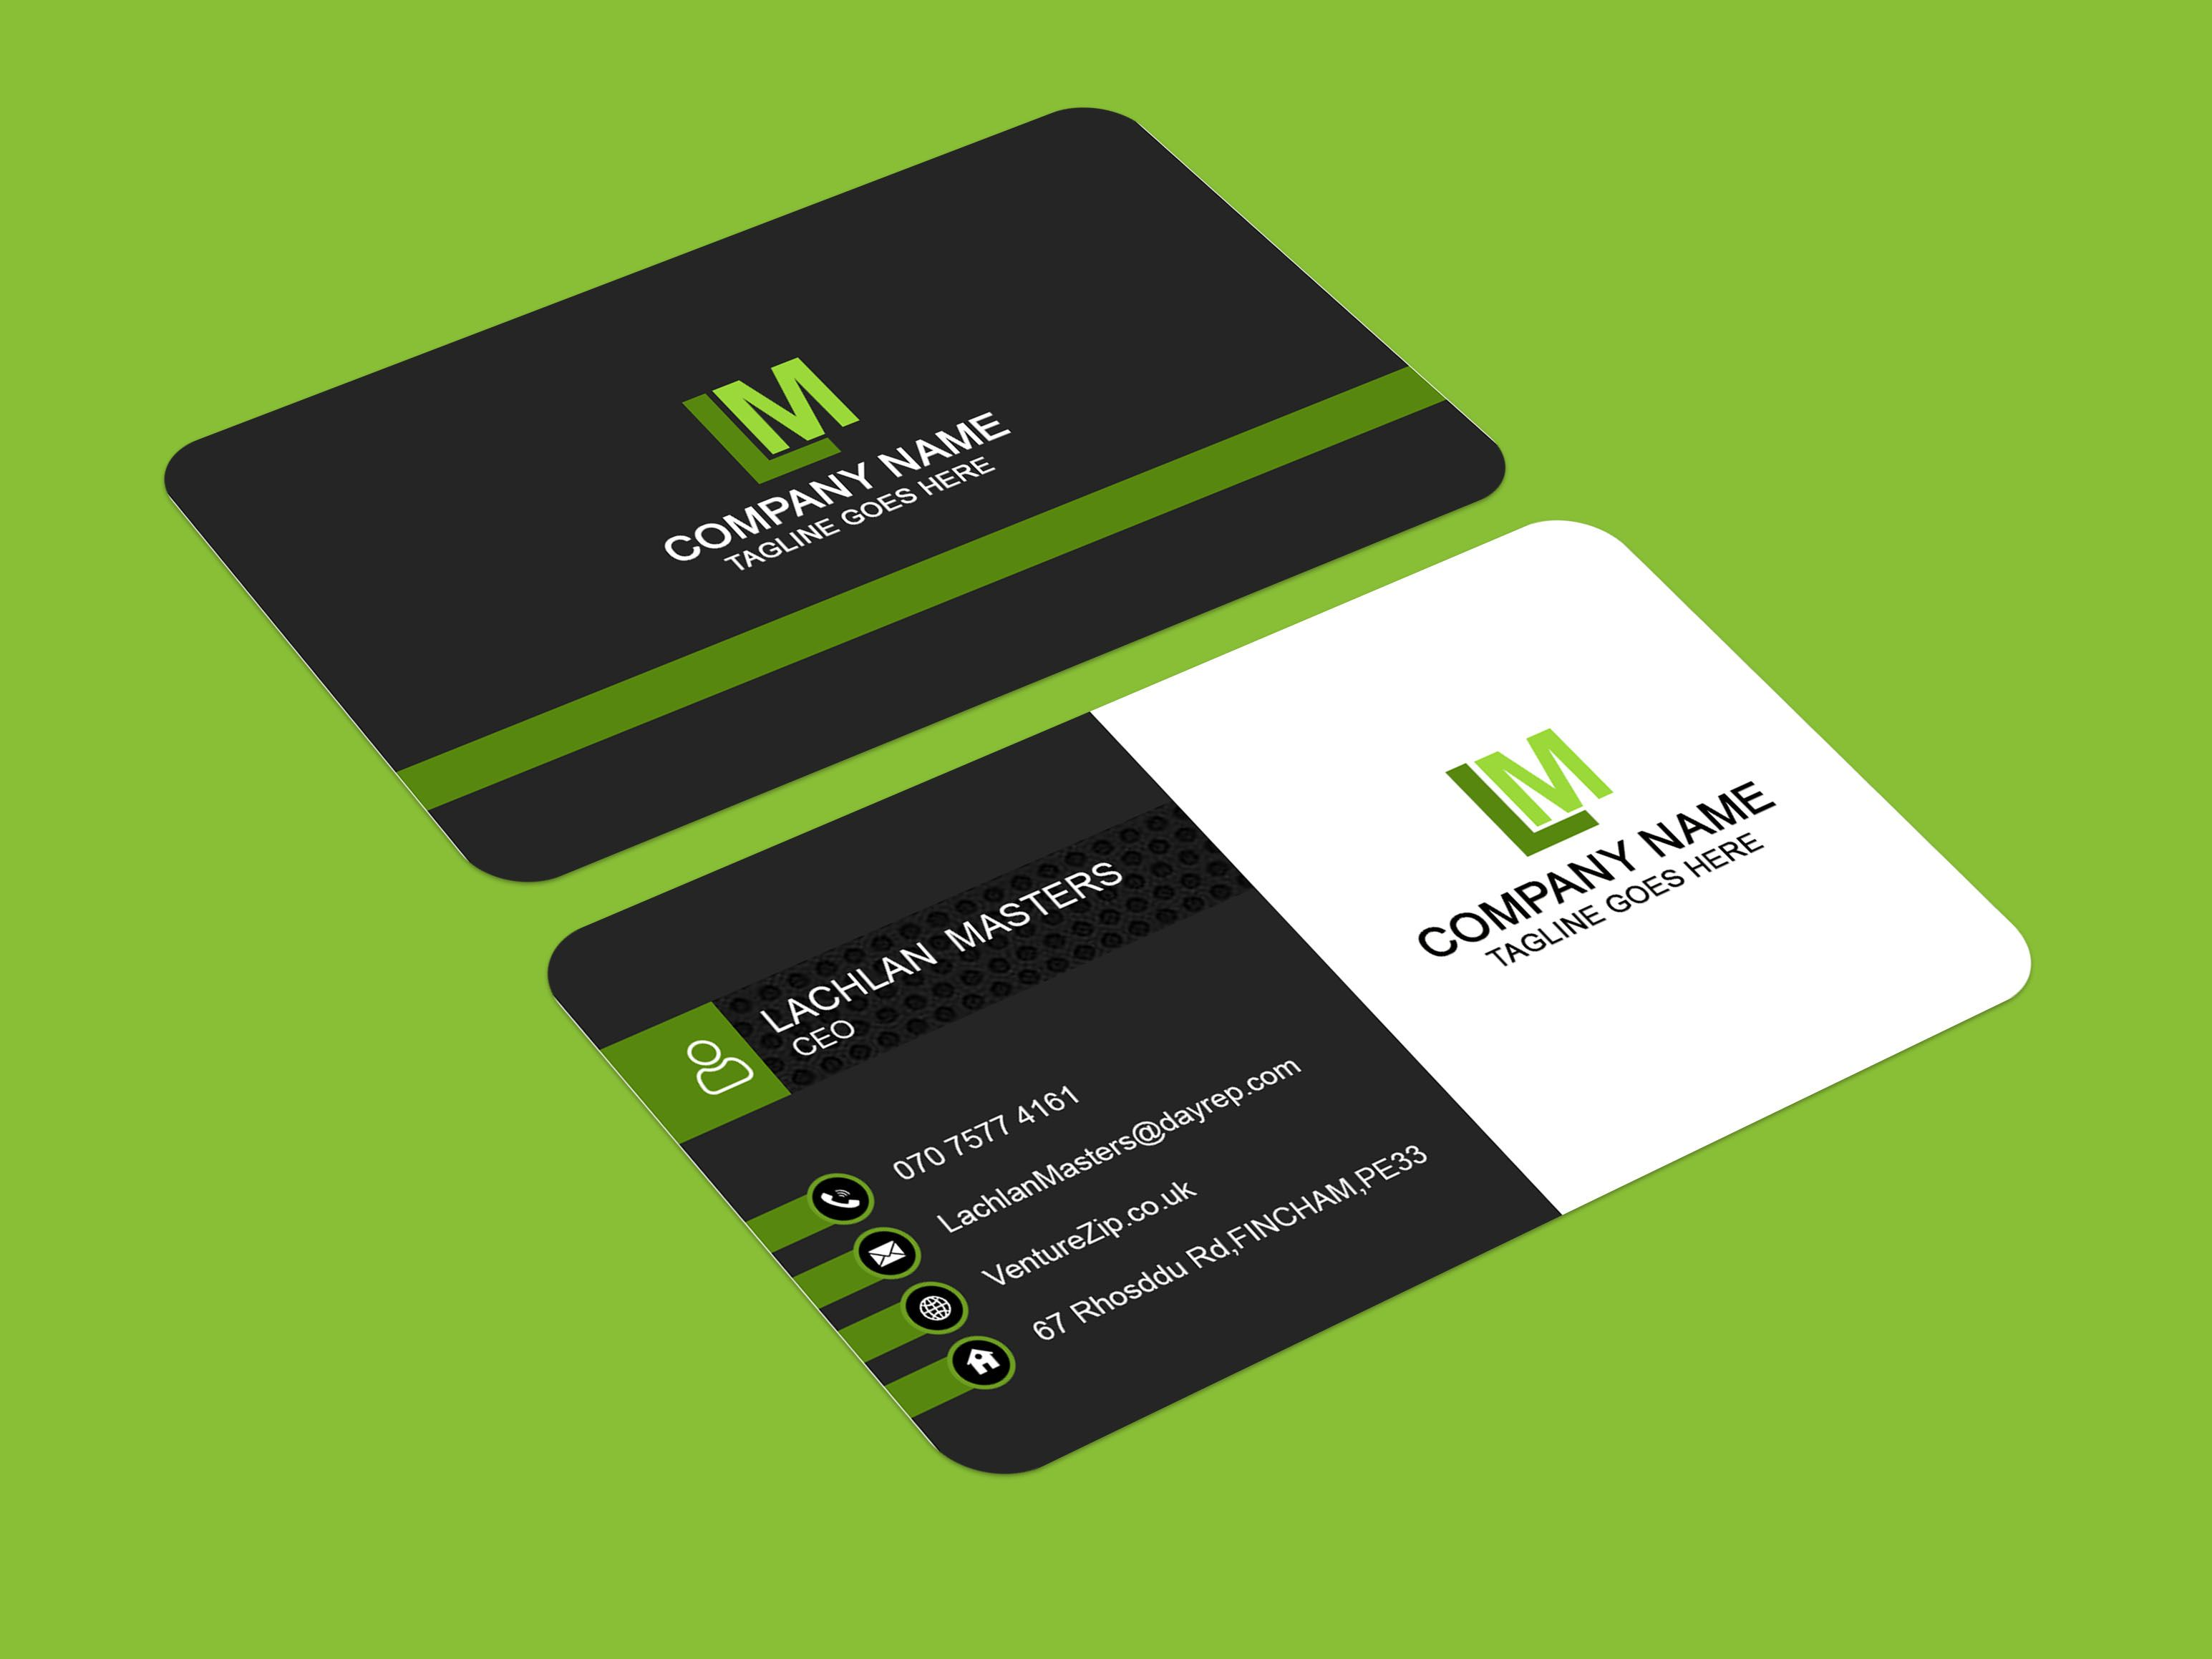 Business Card Design Business Card Design Minimal Printing Business Cards Business Card Design